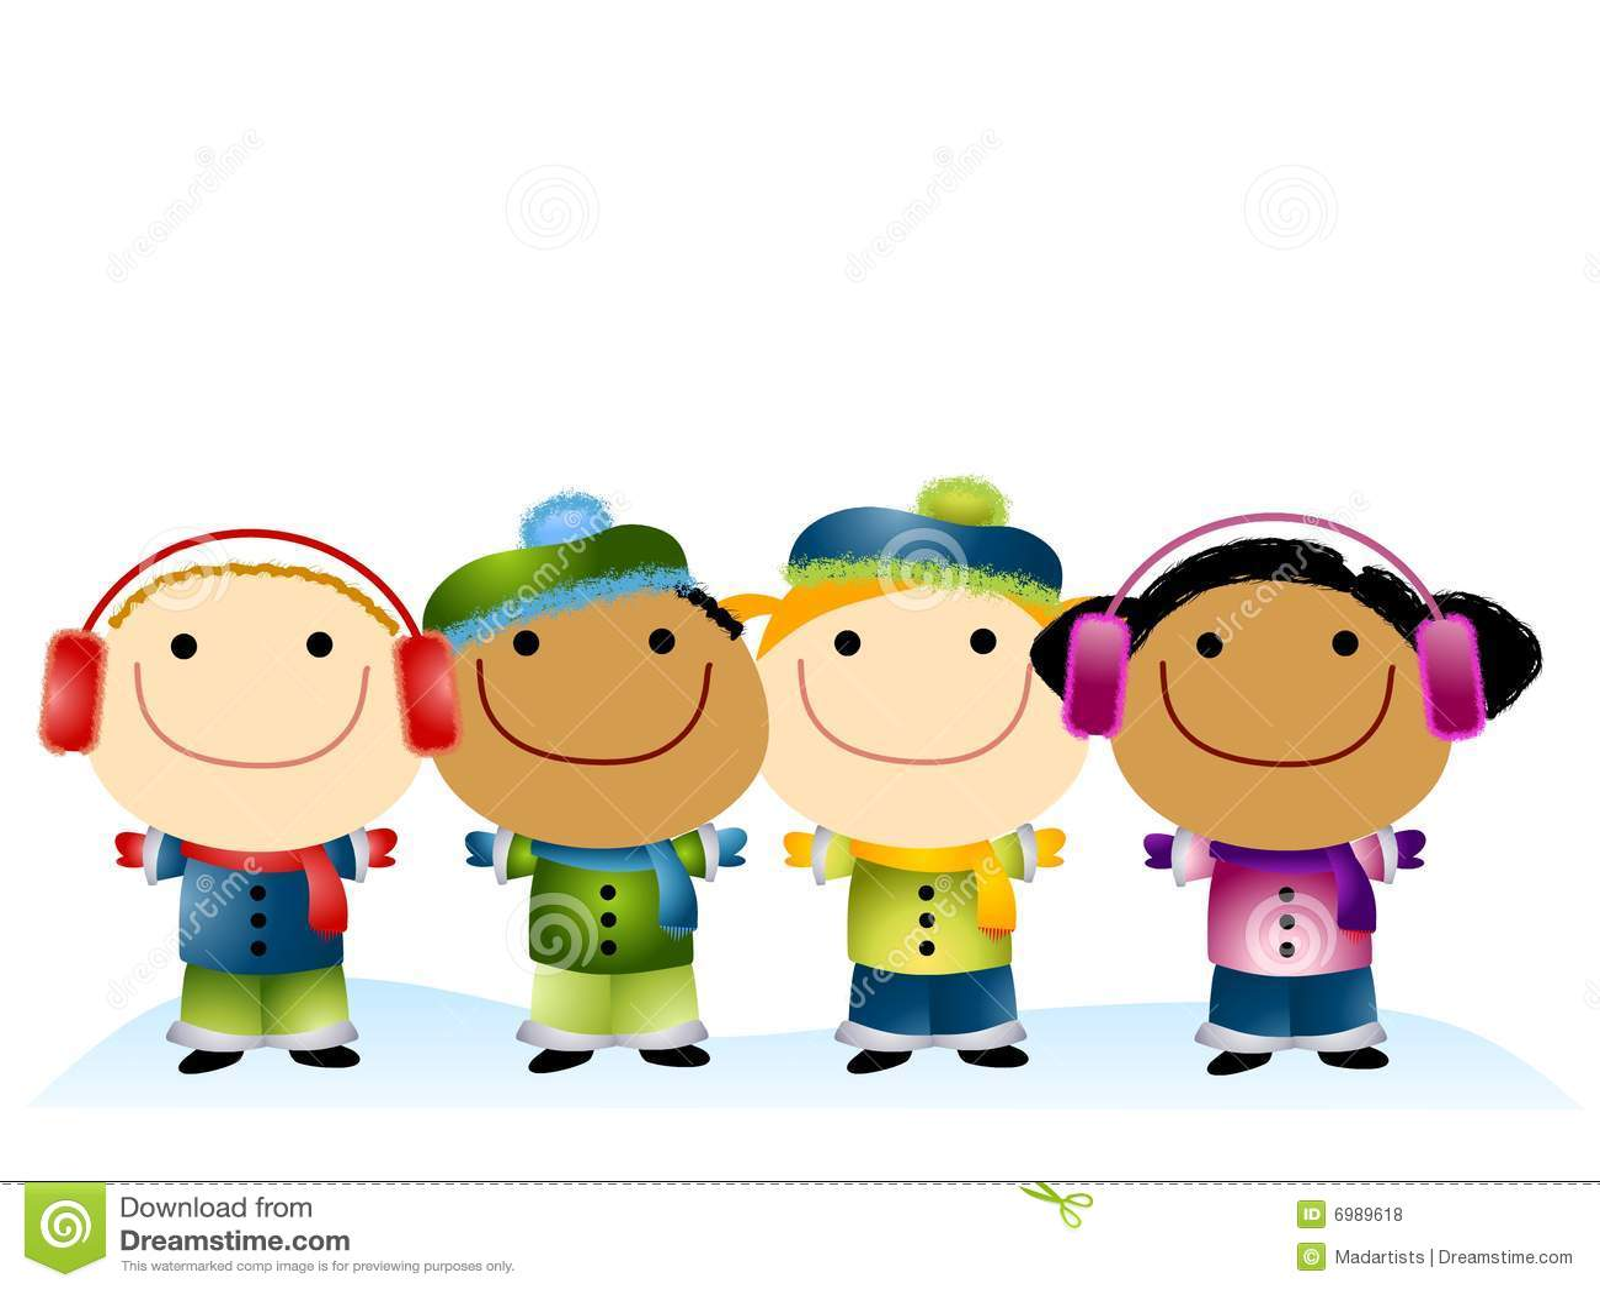 cartoon dressed hats illustration kids - Free Cartoon Download For Kids